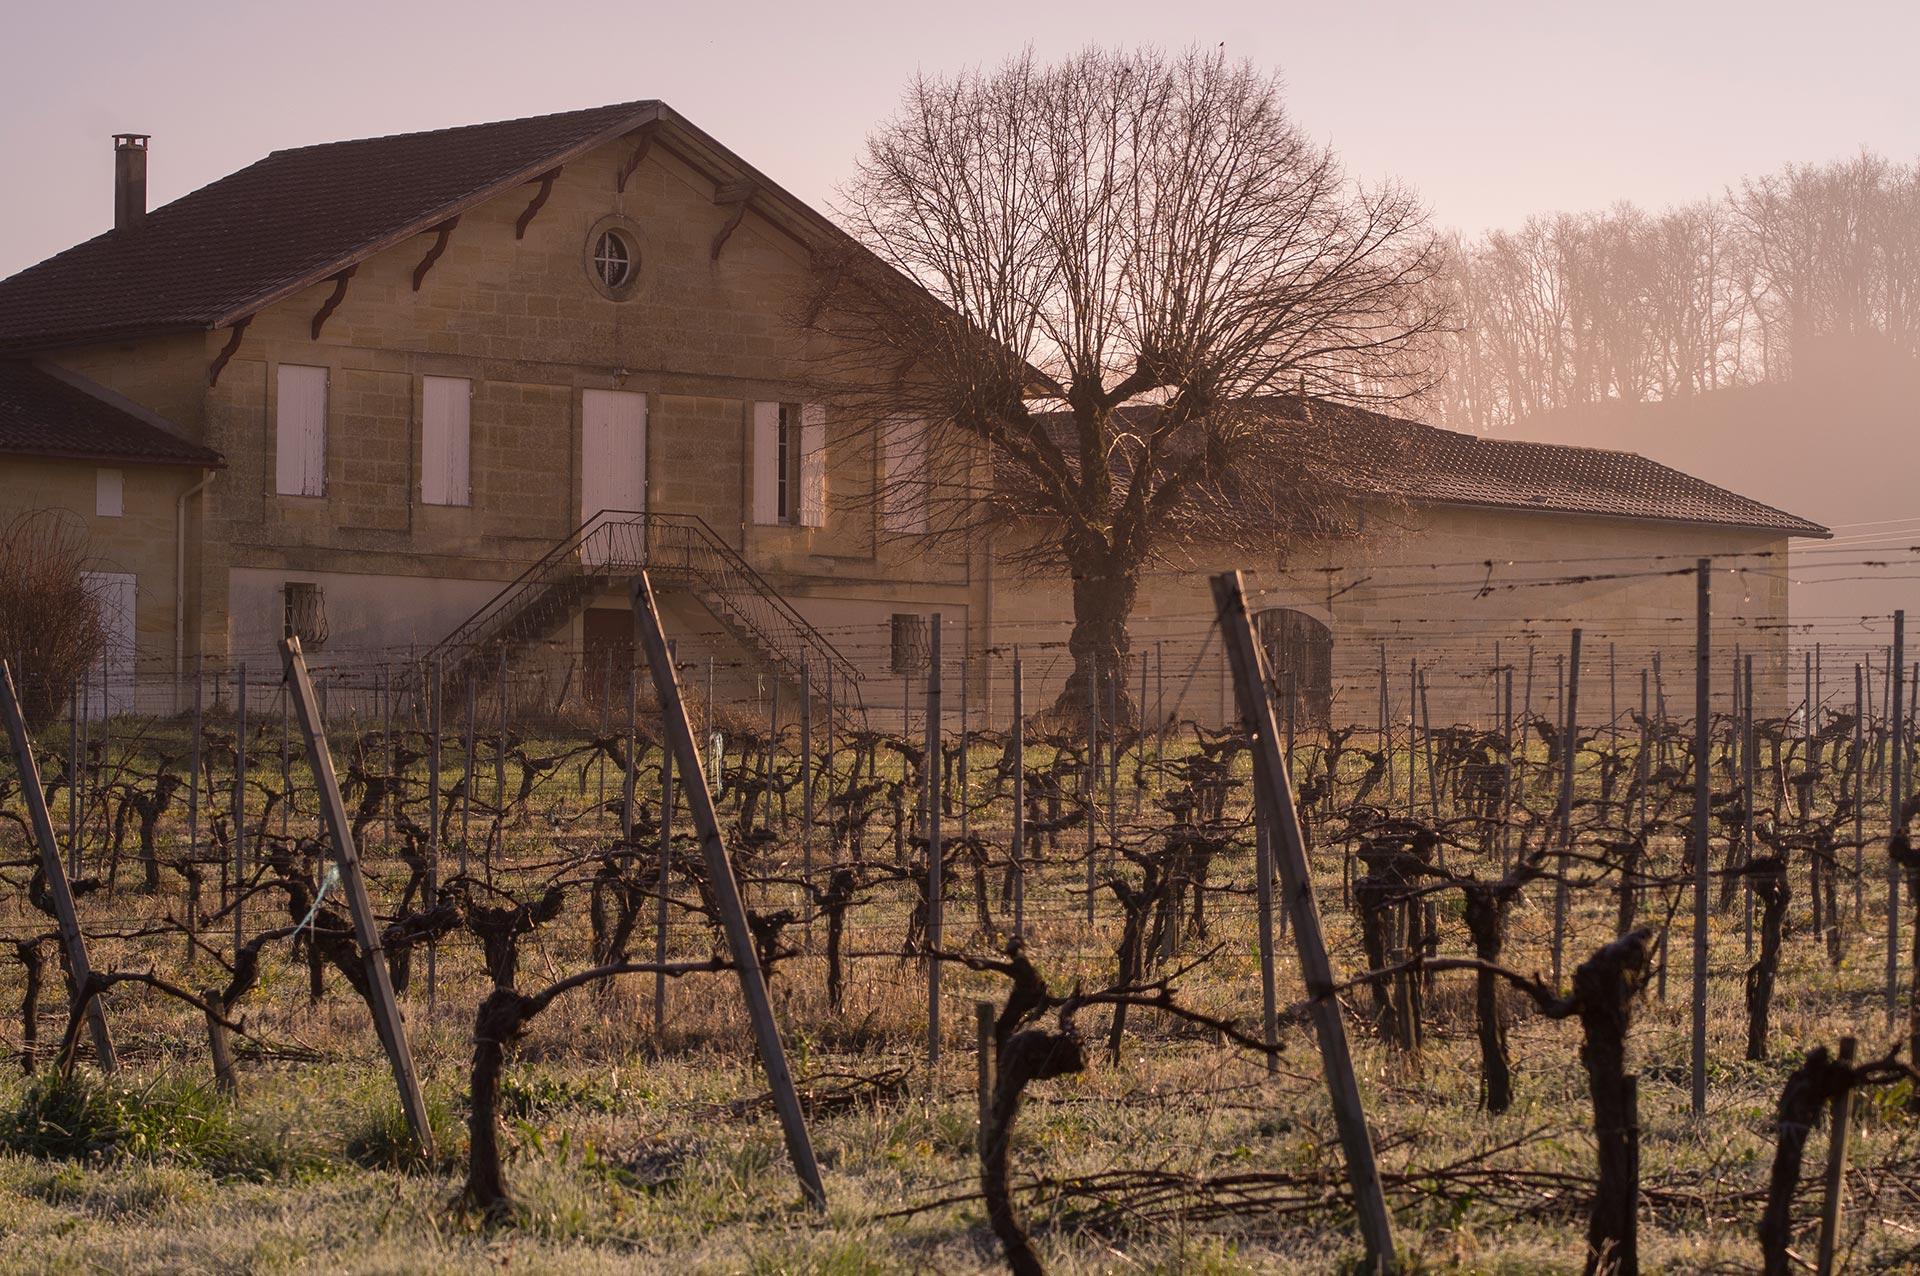 A Misty Morn at Château de Colombe